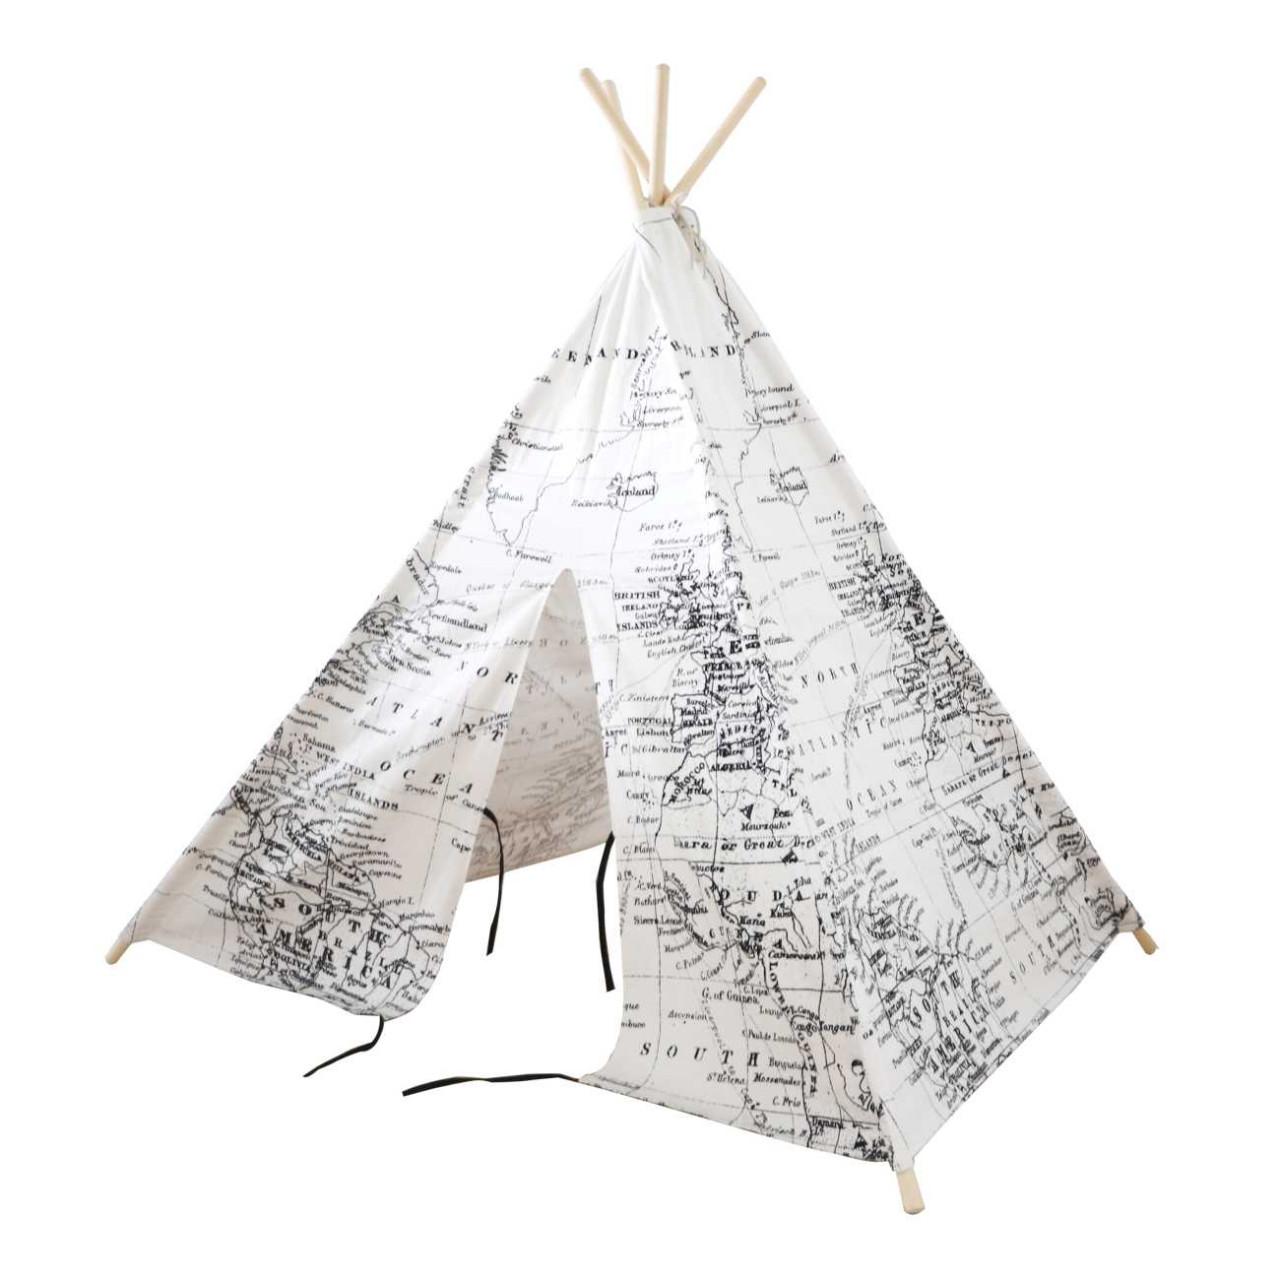 Kinder Spielzelt Tipi Zelt Weltkarte, Teeepee, Indianerzelt